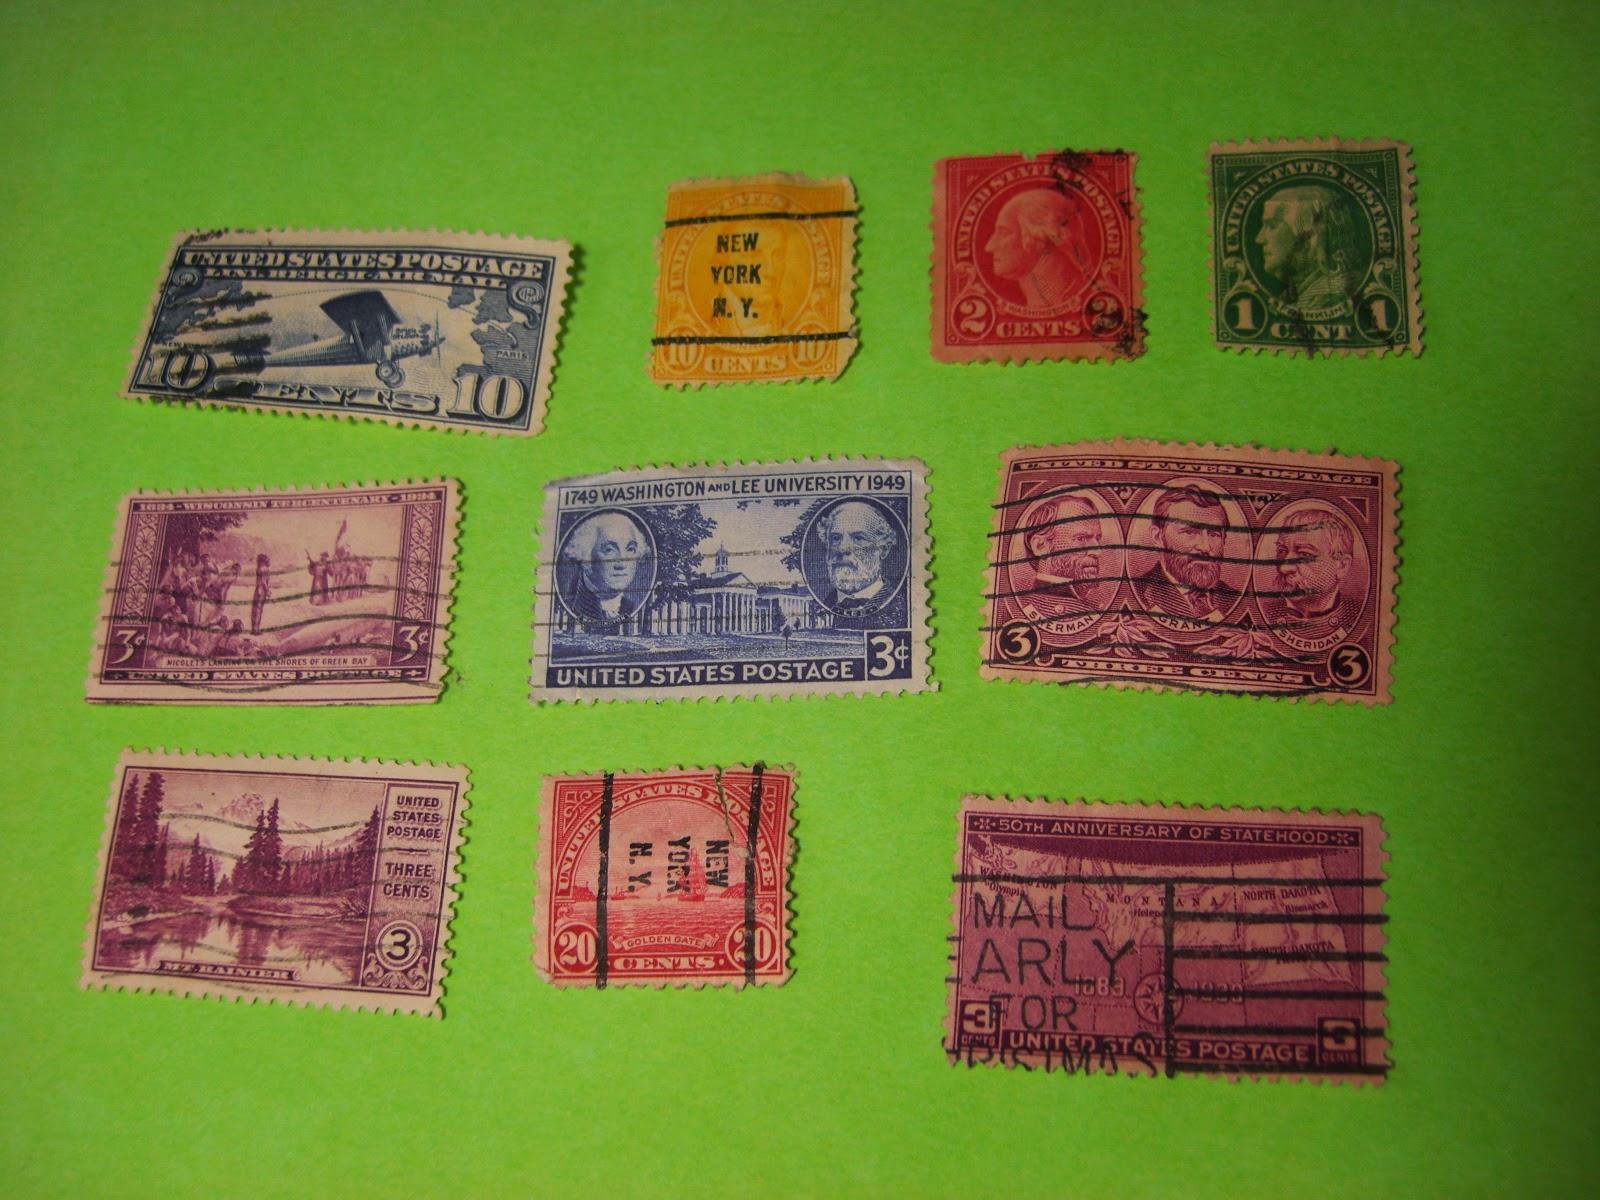 http://bargaincart.ecrater.com/p/22256135/1903-1931-franklin-lindbergh-grant-10-us-stamps